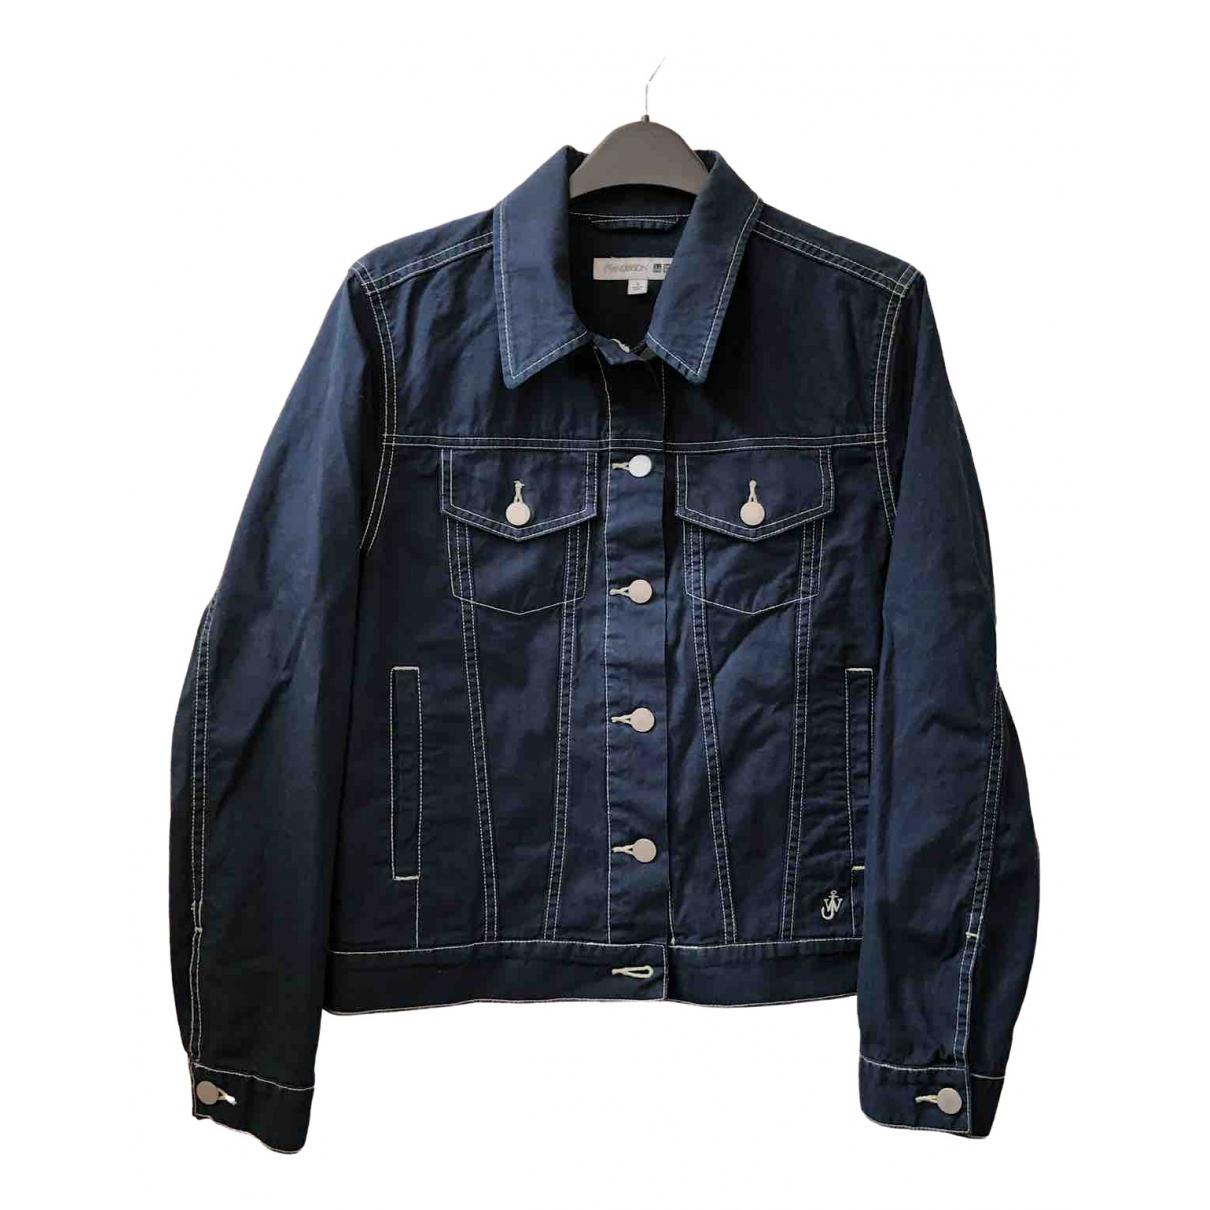 Uniqlo \N Navy Cotton jacket for Women S International